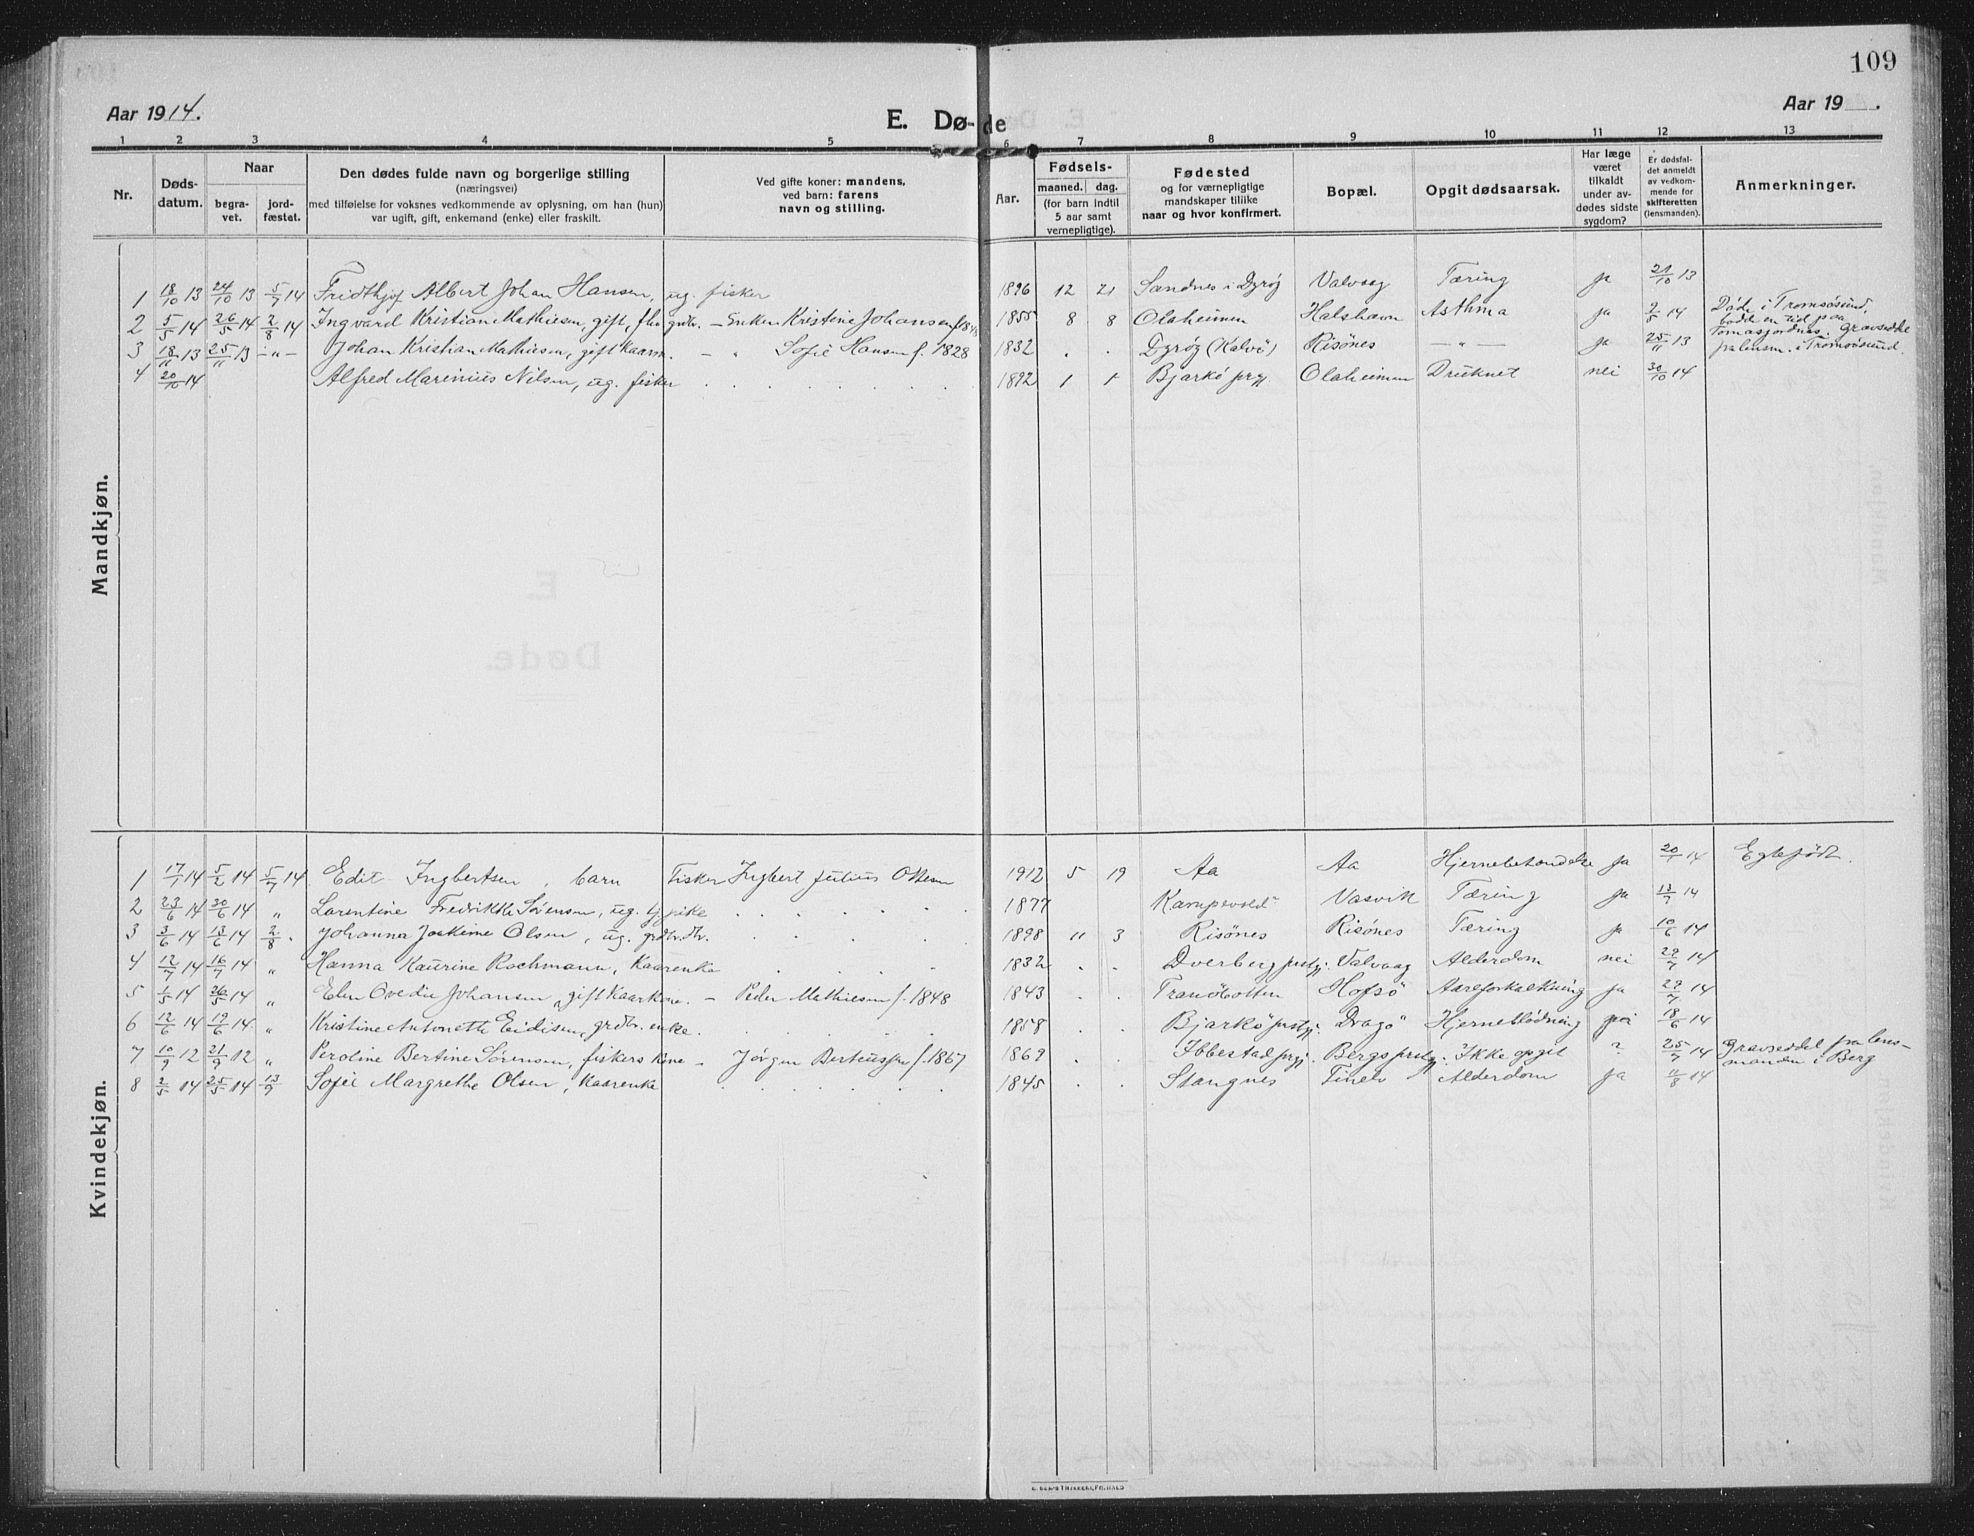 SATØ, Tranøy sokneprestkontor, I/Ia/Iab/L0019klokker: Klokkerbok nr. 19, 1914-1940, s. 109